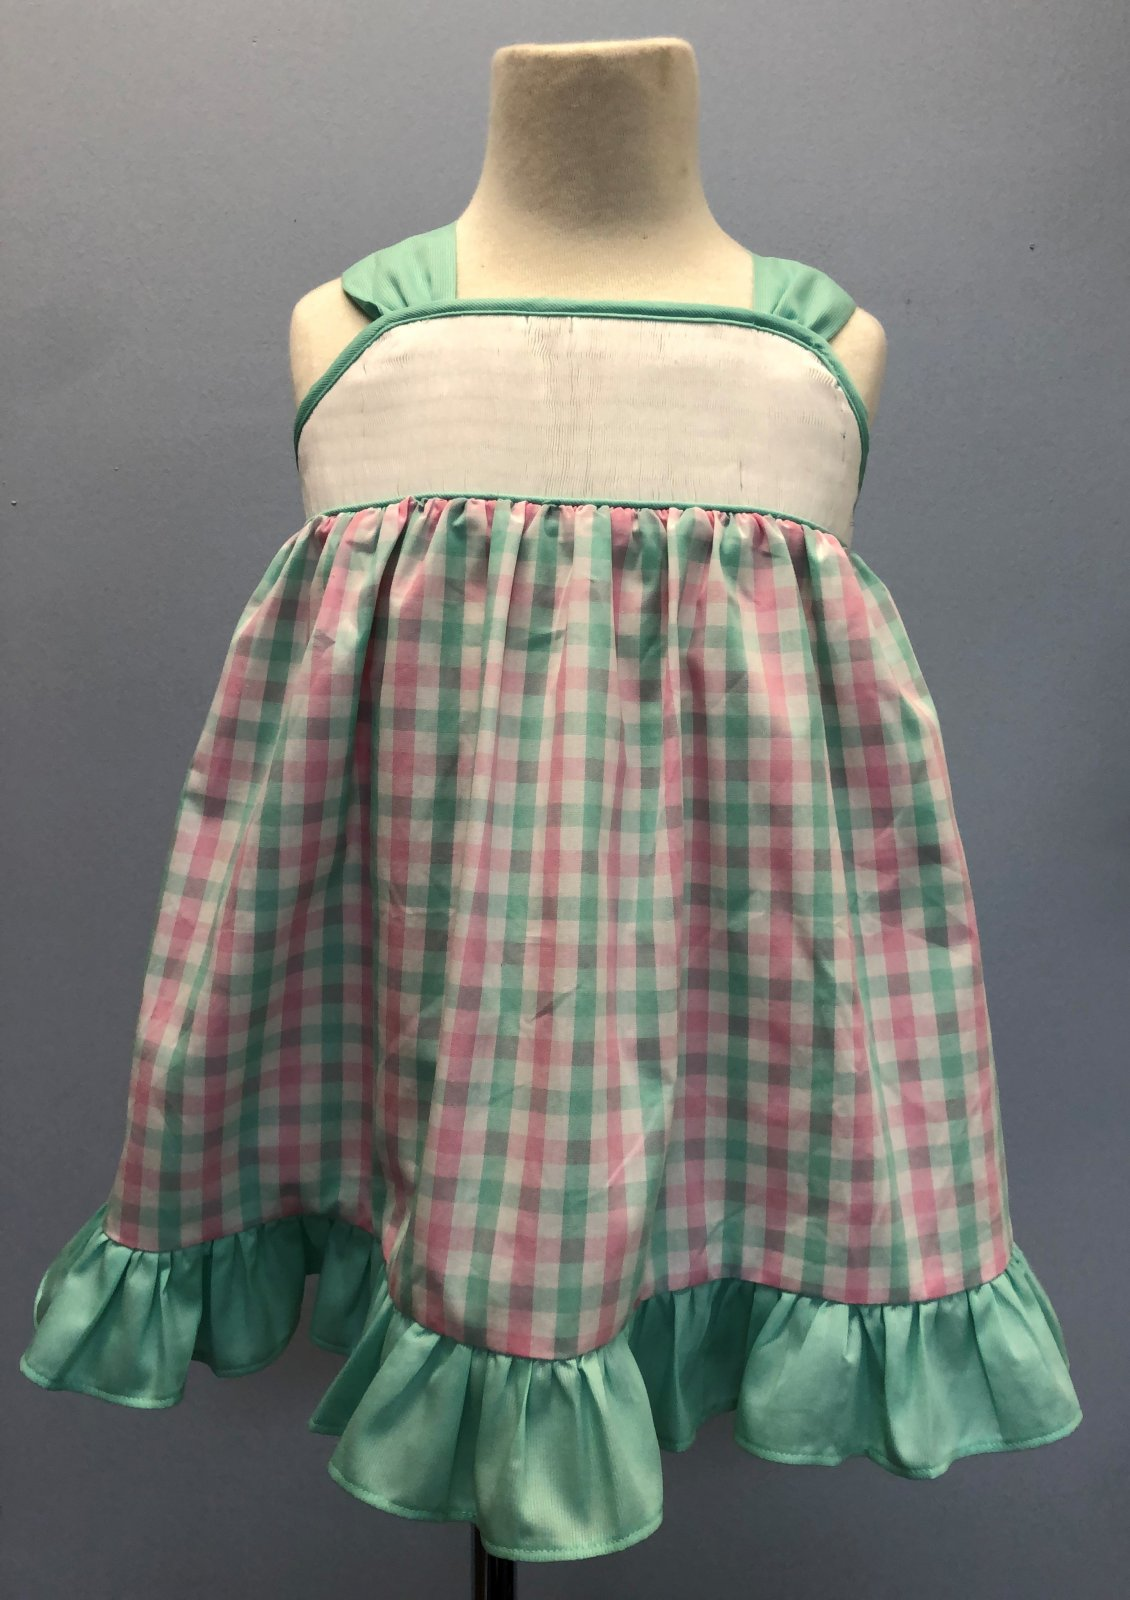 Girls Sundress pink and aqua check with aqua trim and bow